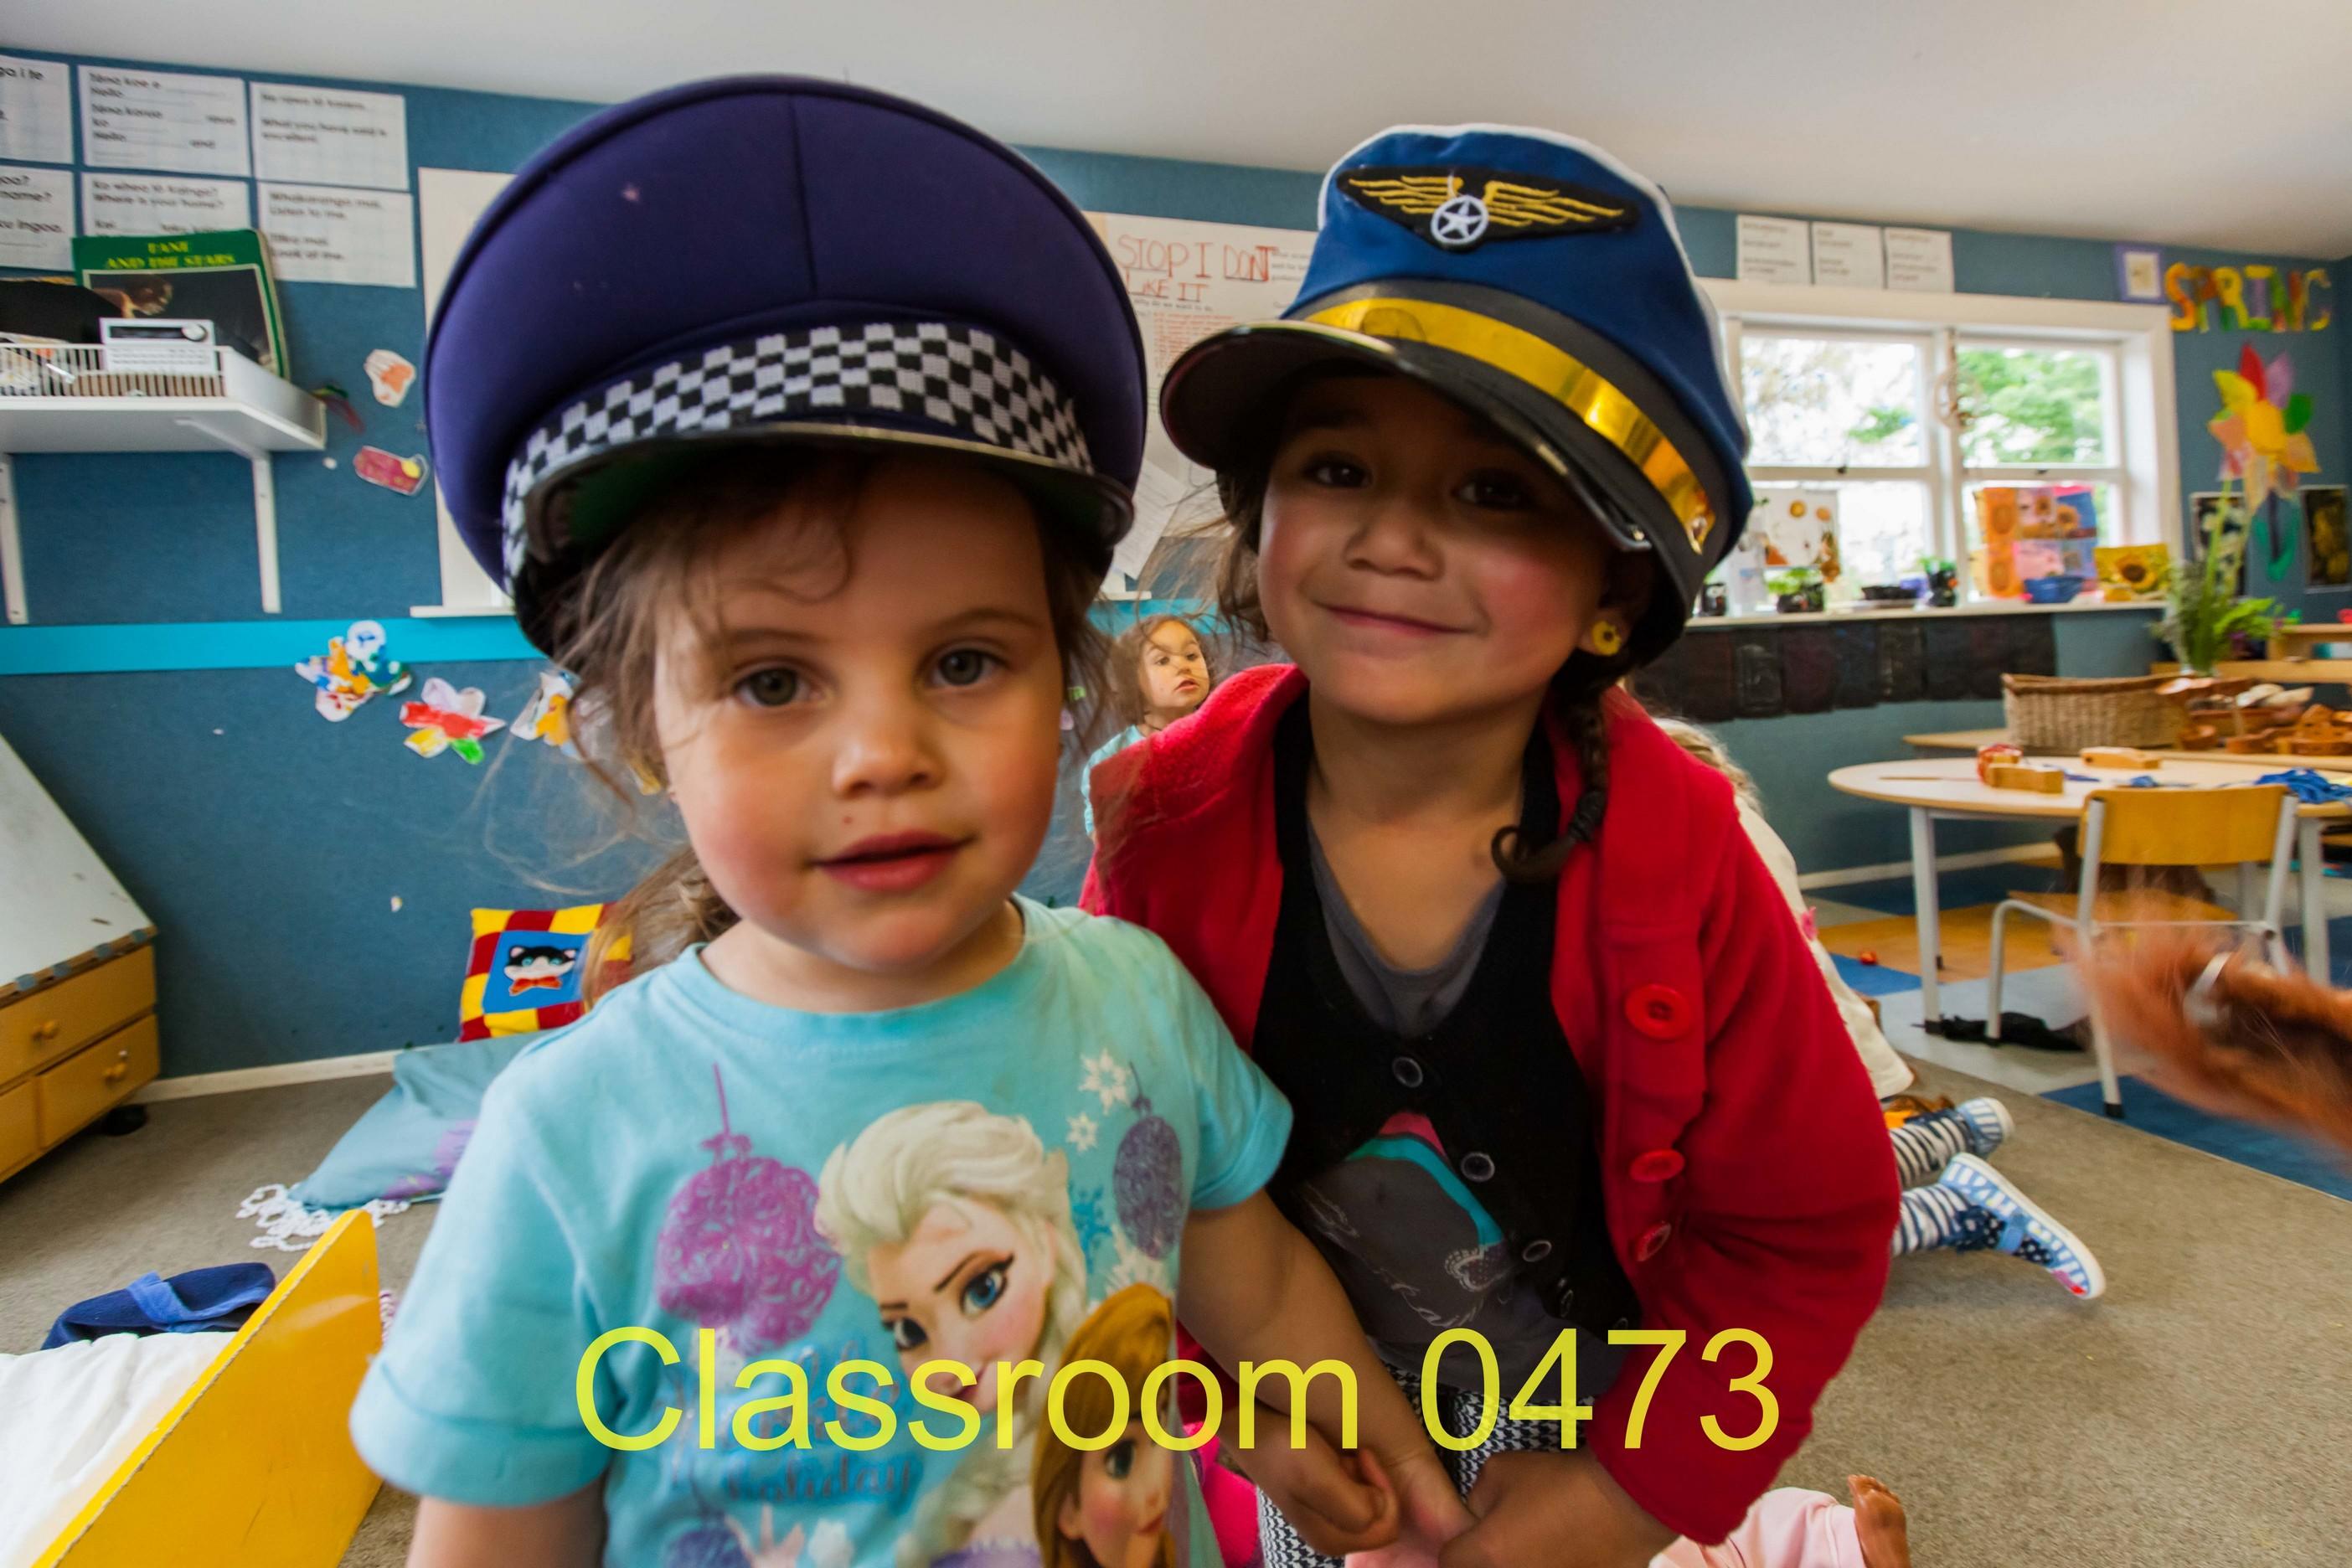 Classroom 0473